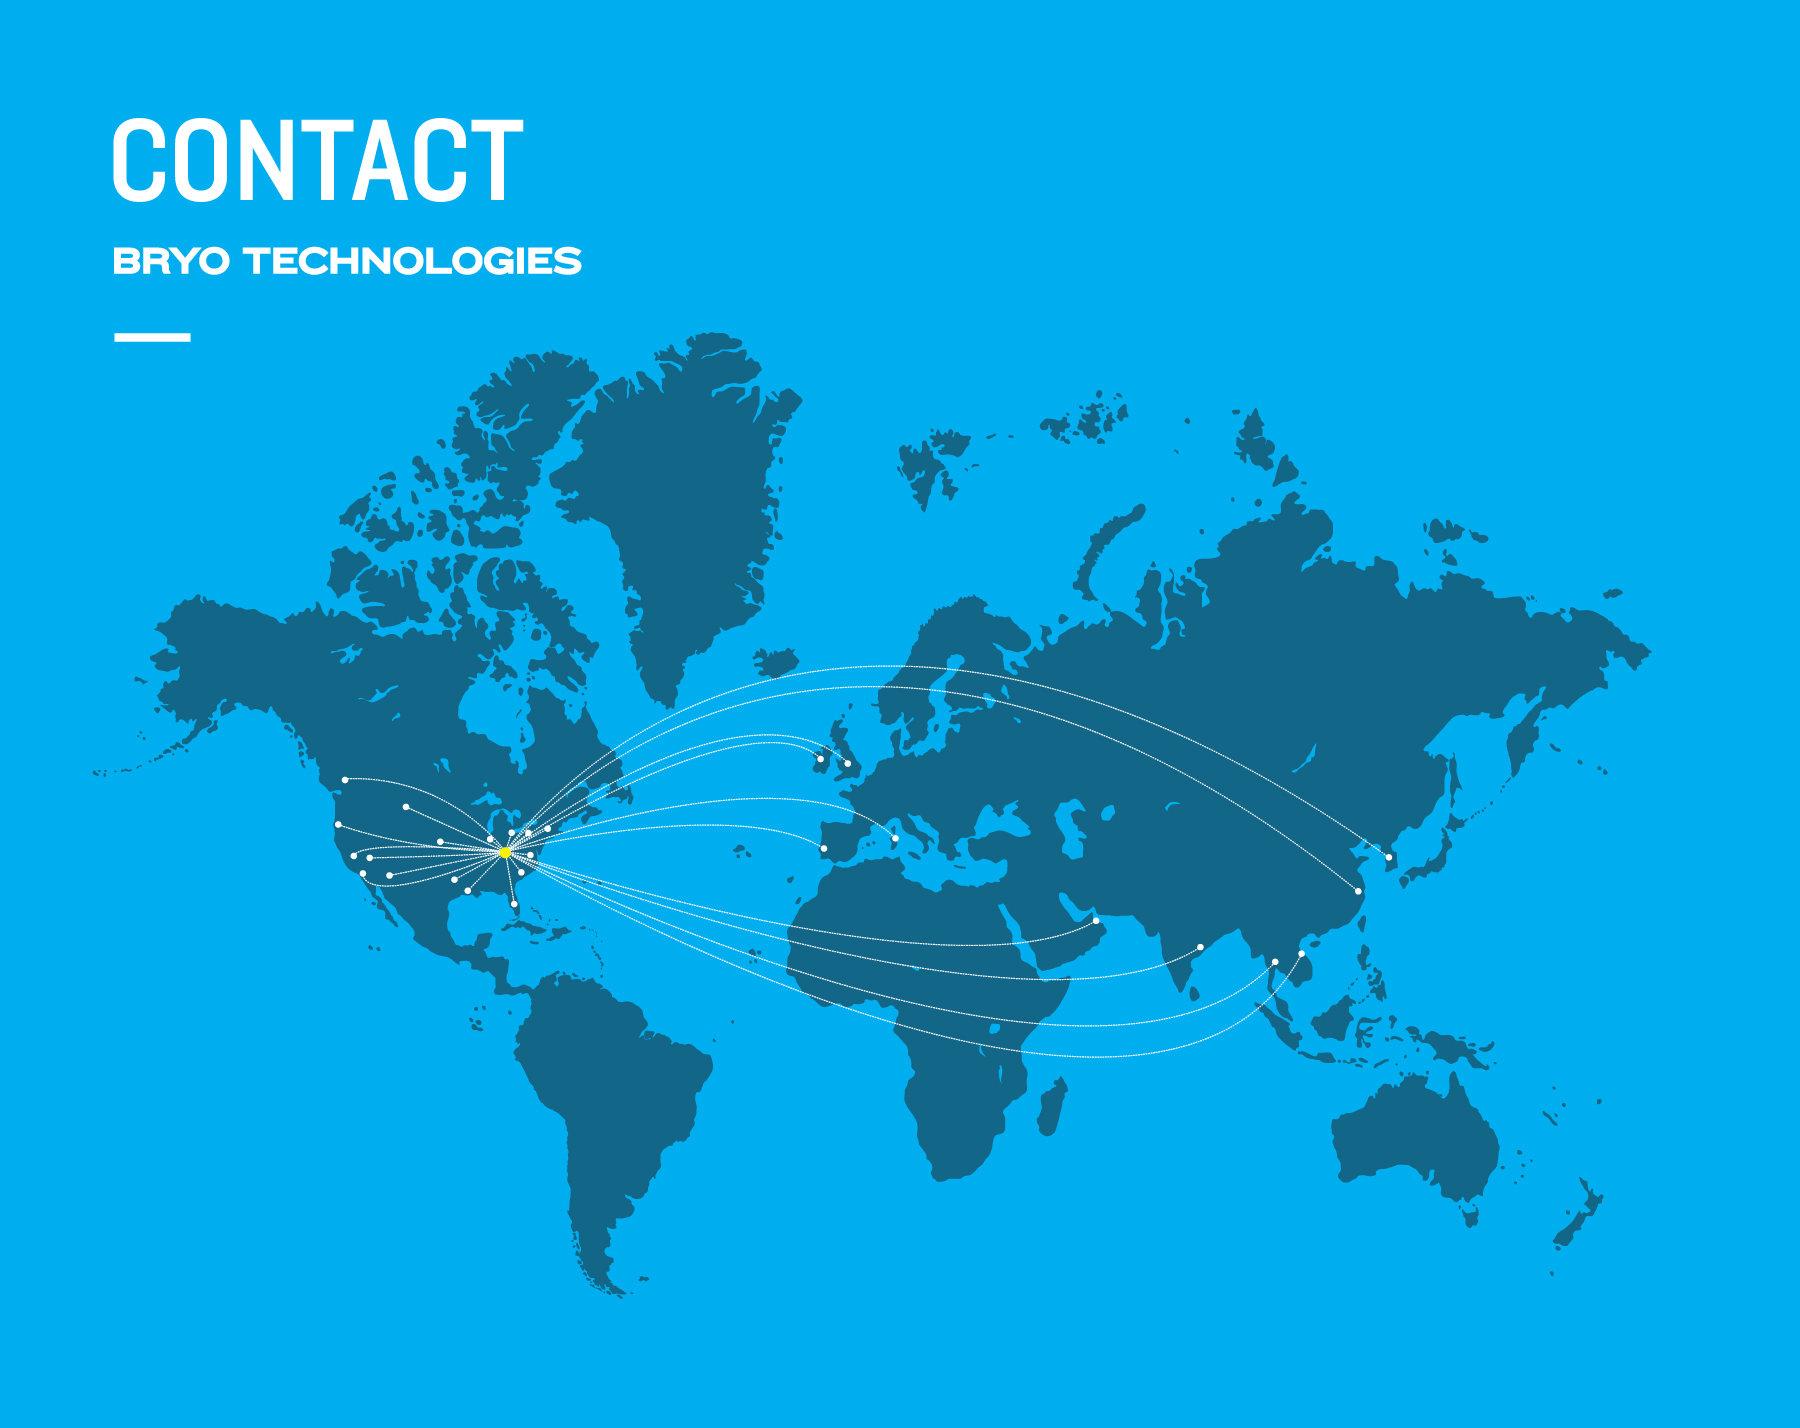 Contact Bryo Technologies